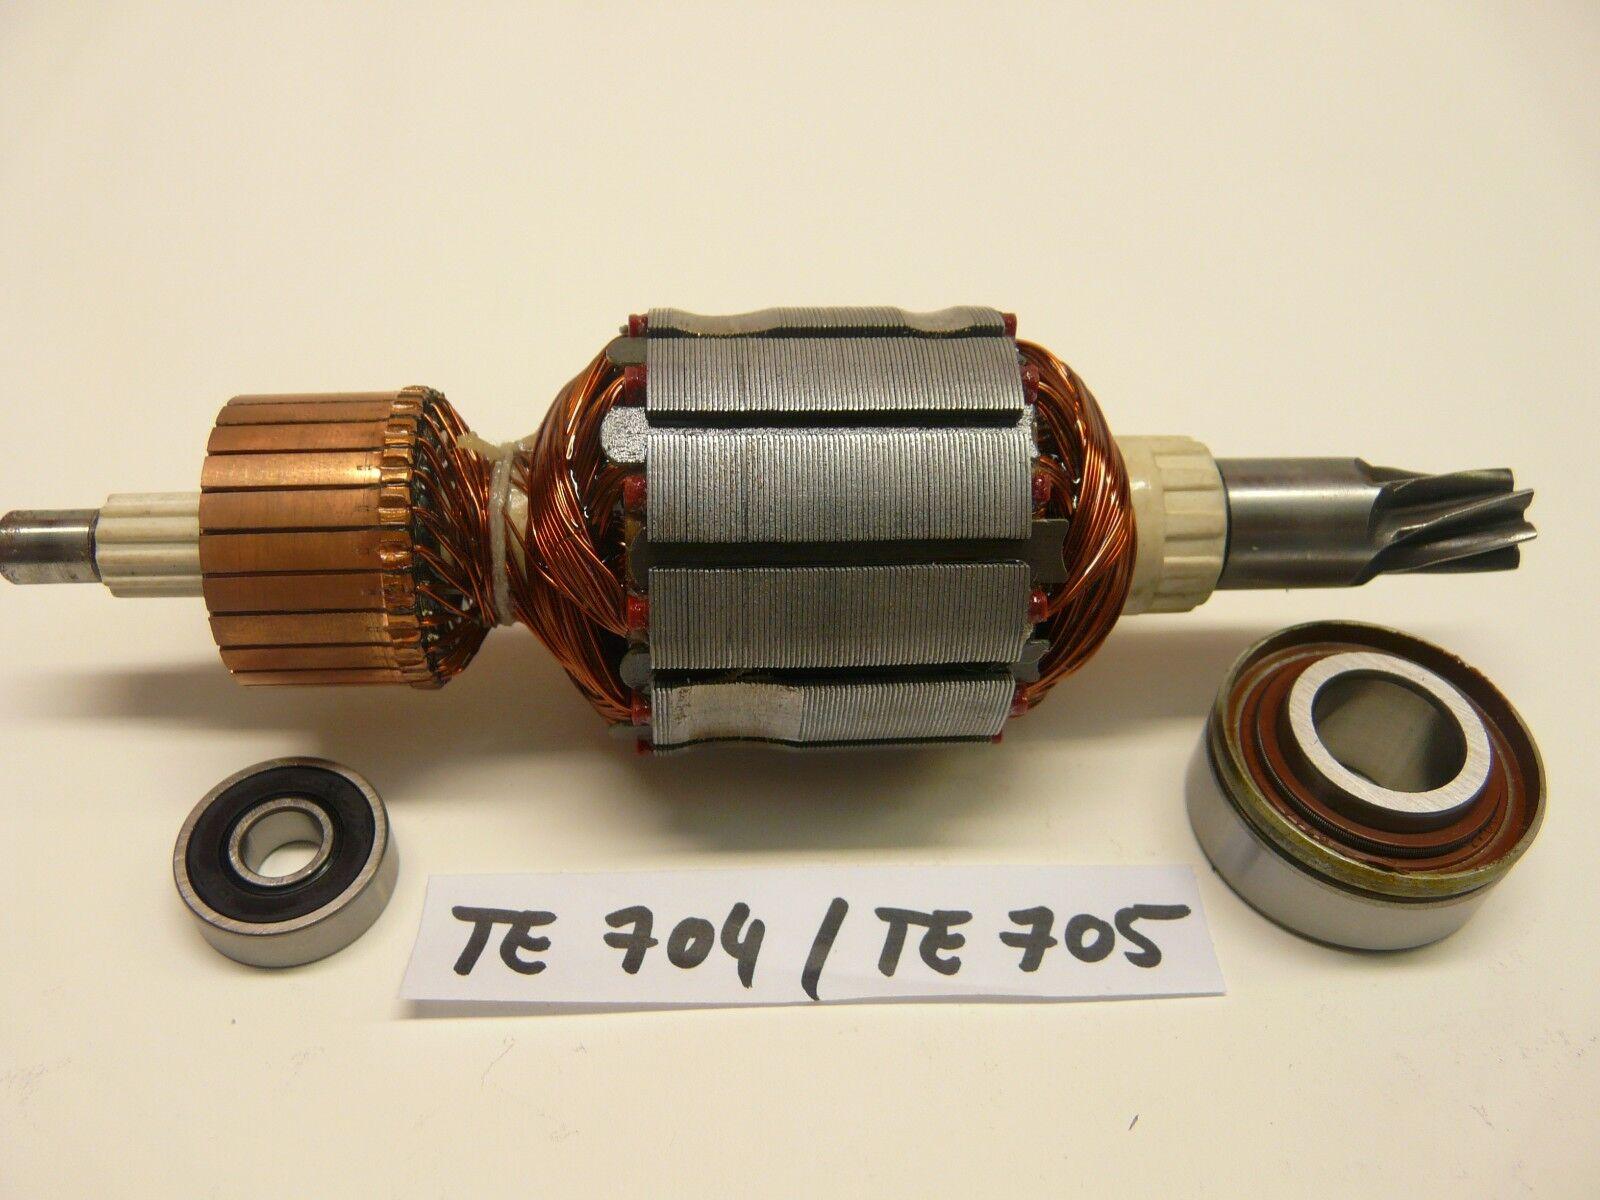 Hilti TE 704   TE 705 Rotor, Anker mit beiden Lagern vom Rotor